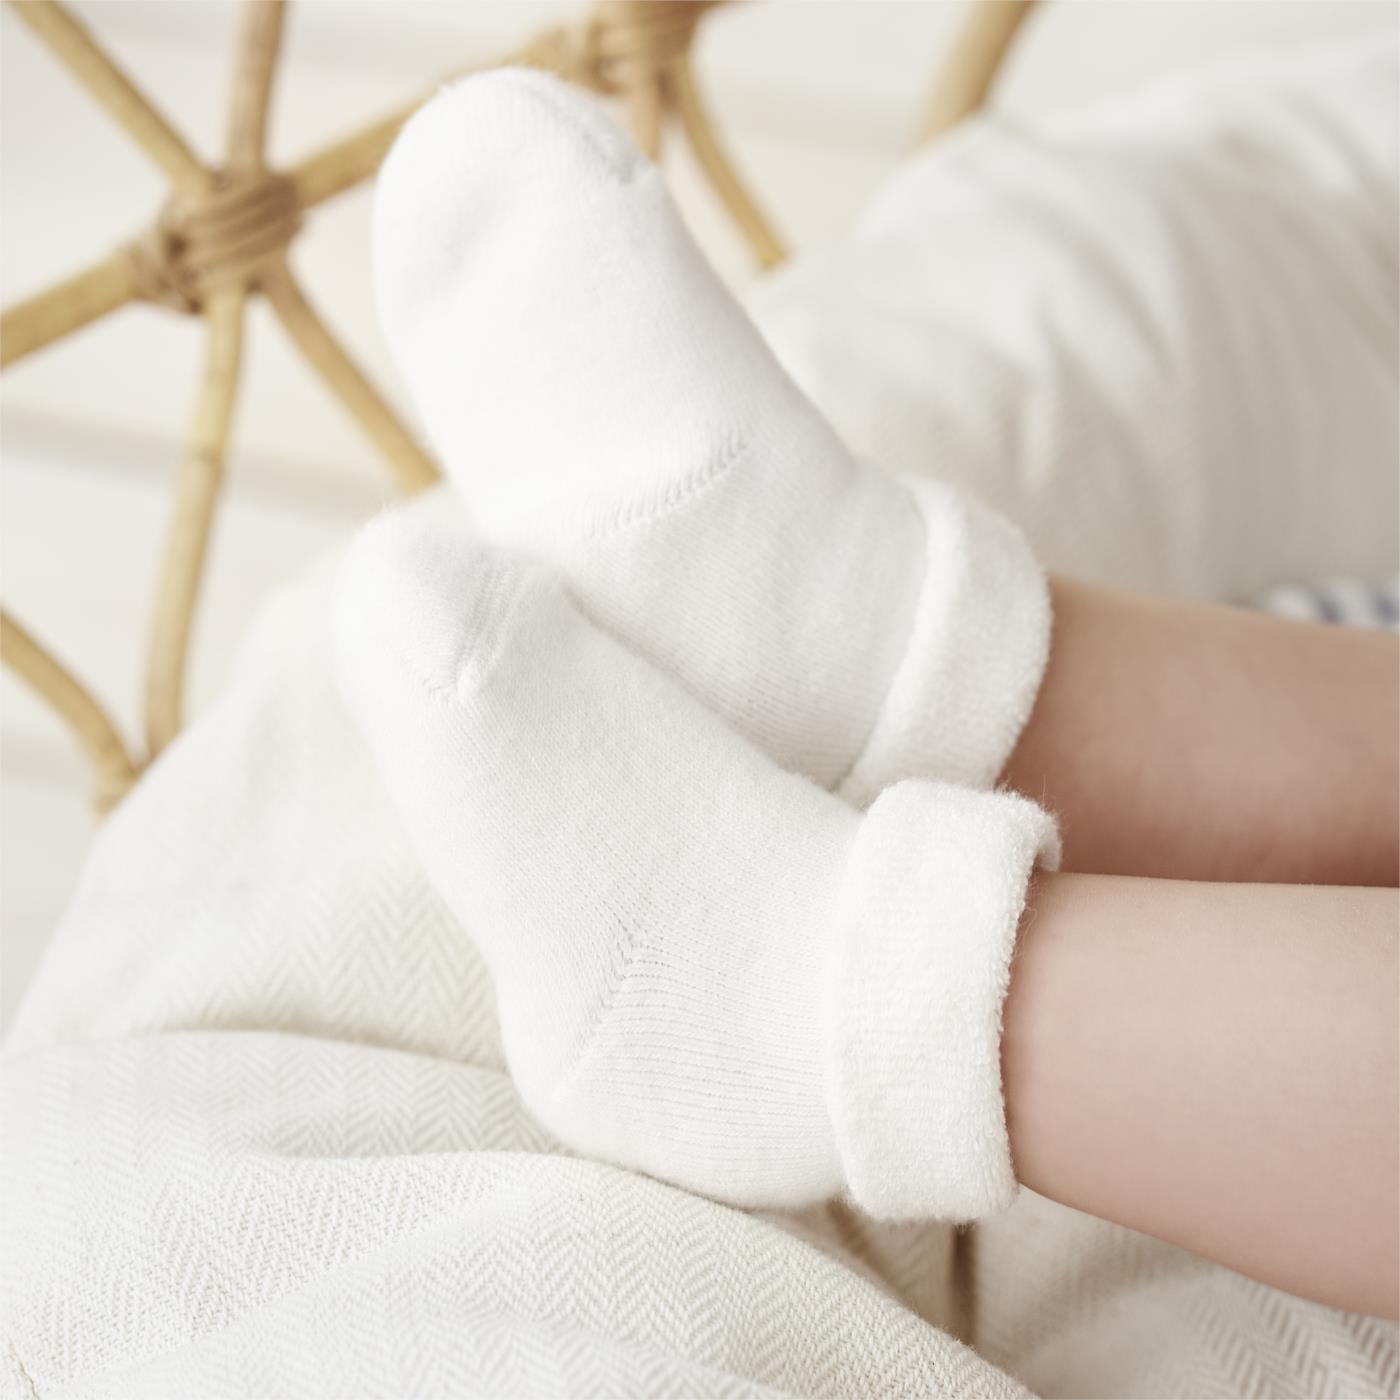 GECKO Baby socks